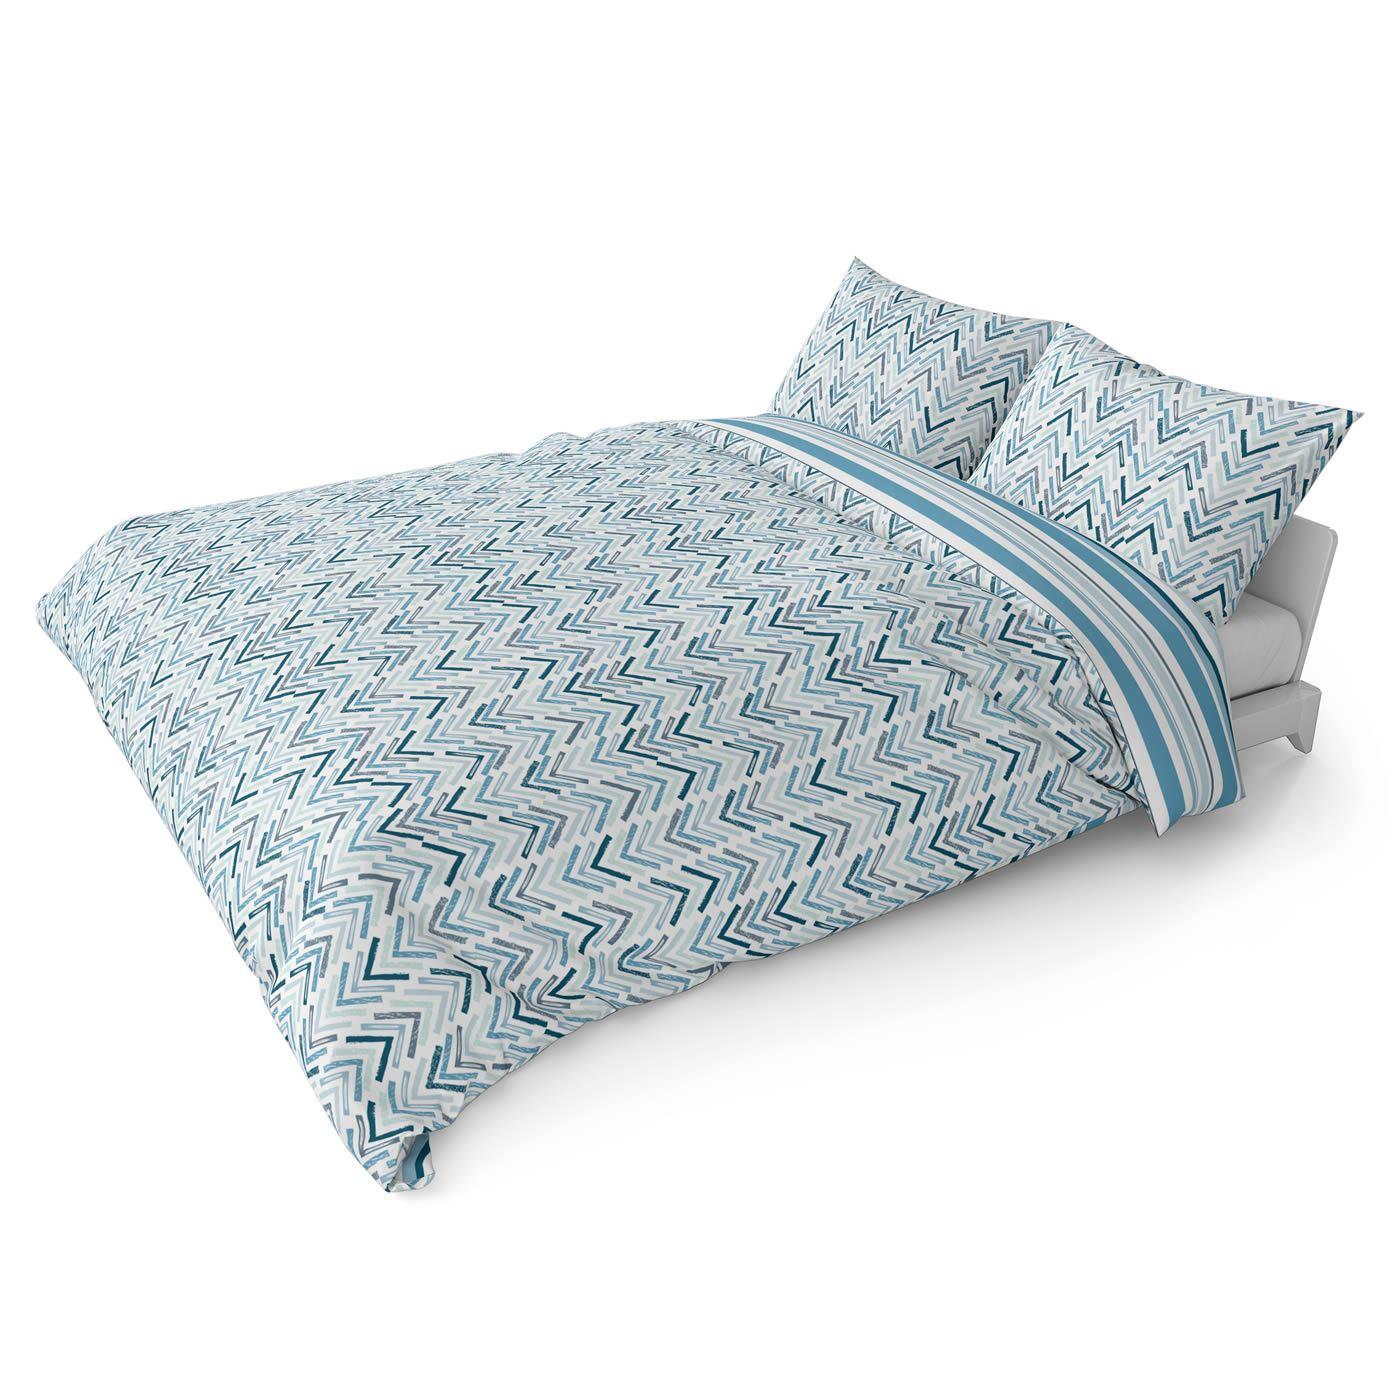 Funda-nordica-azul-azul-marino-verde-azulado-edredon-algodon-estampado-juego-conjuntos-de-cama-cubre miniatura 14